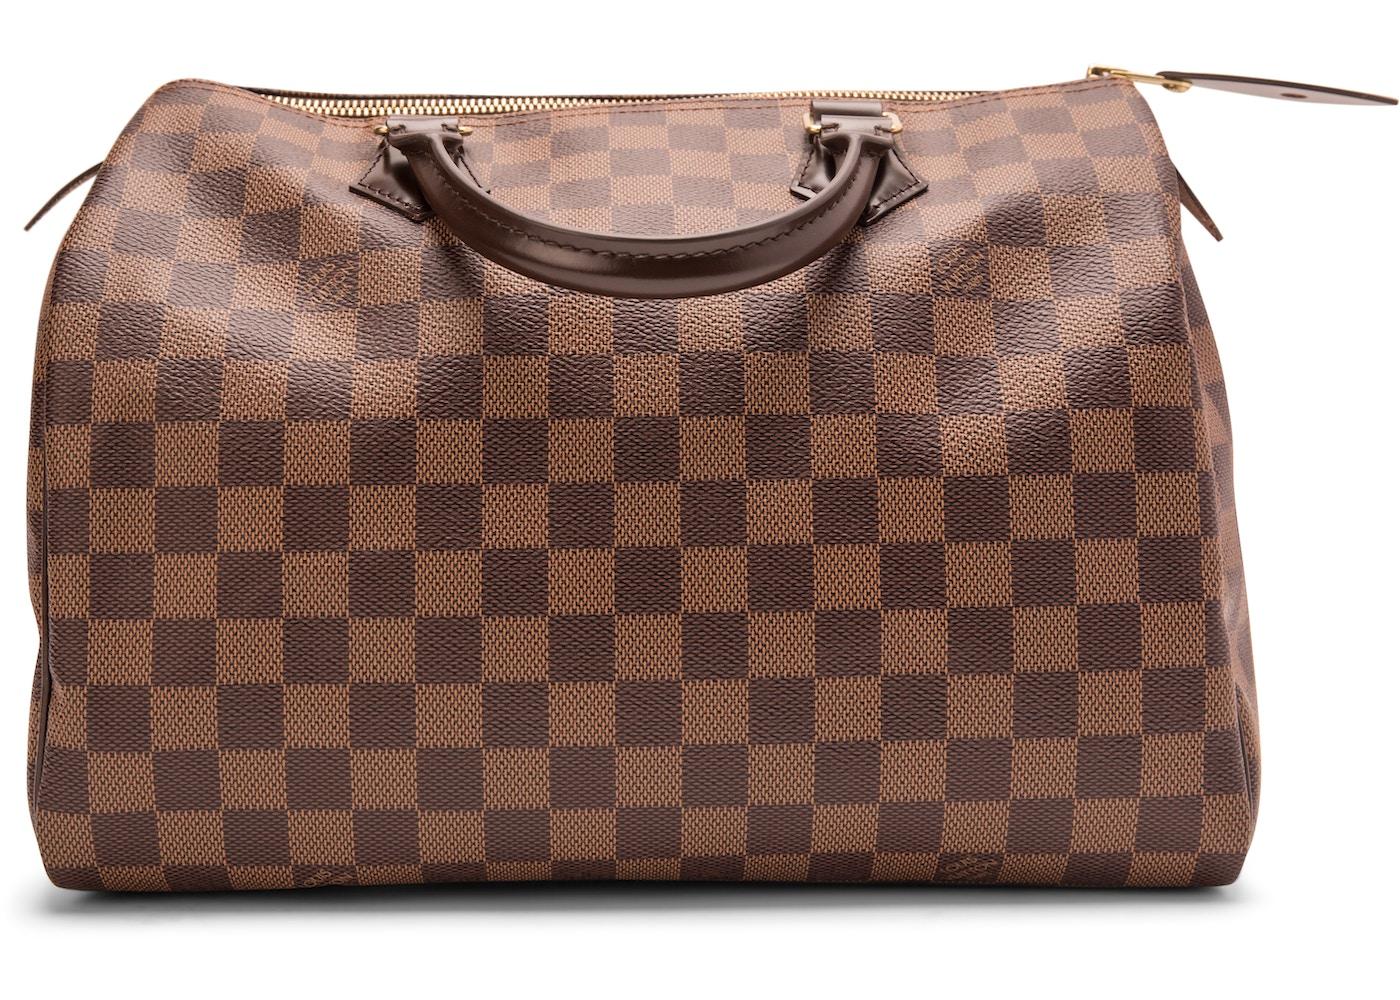 0ad8d145804 Louis Vuitton Speedy Damier Ebene (Without Accessories) 30 Brown